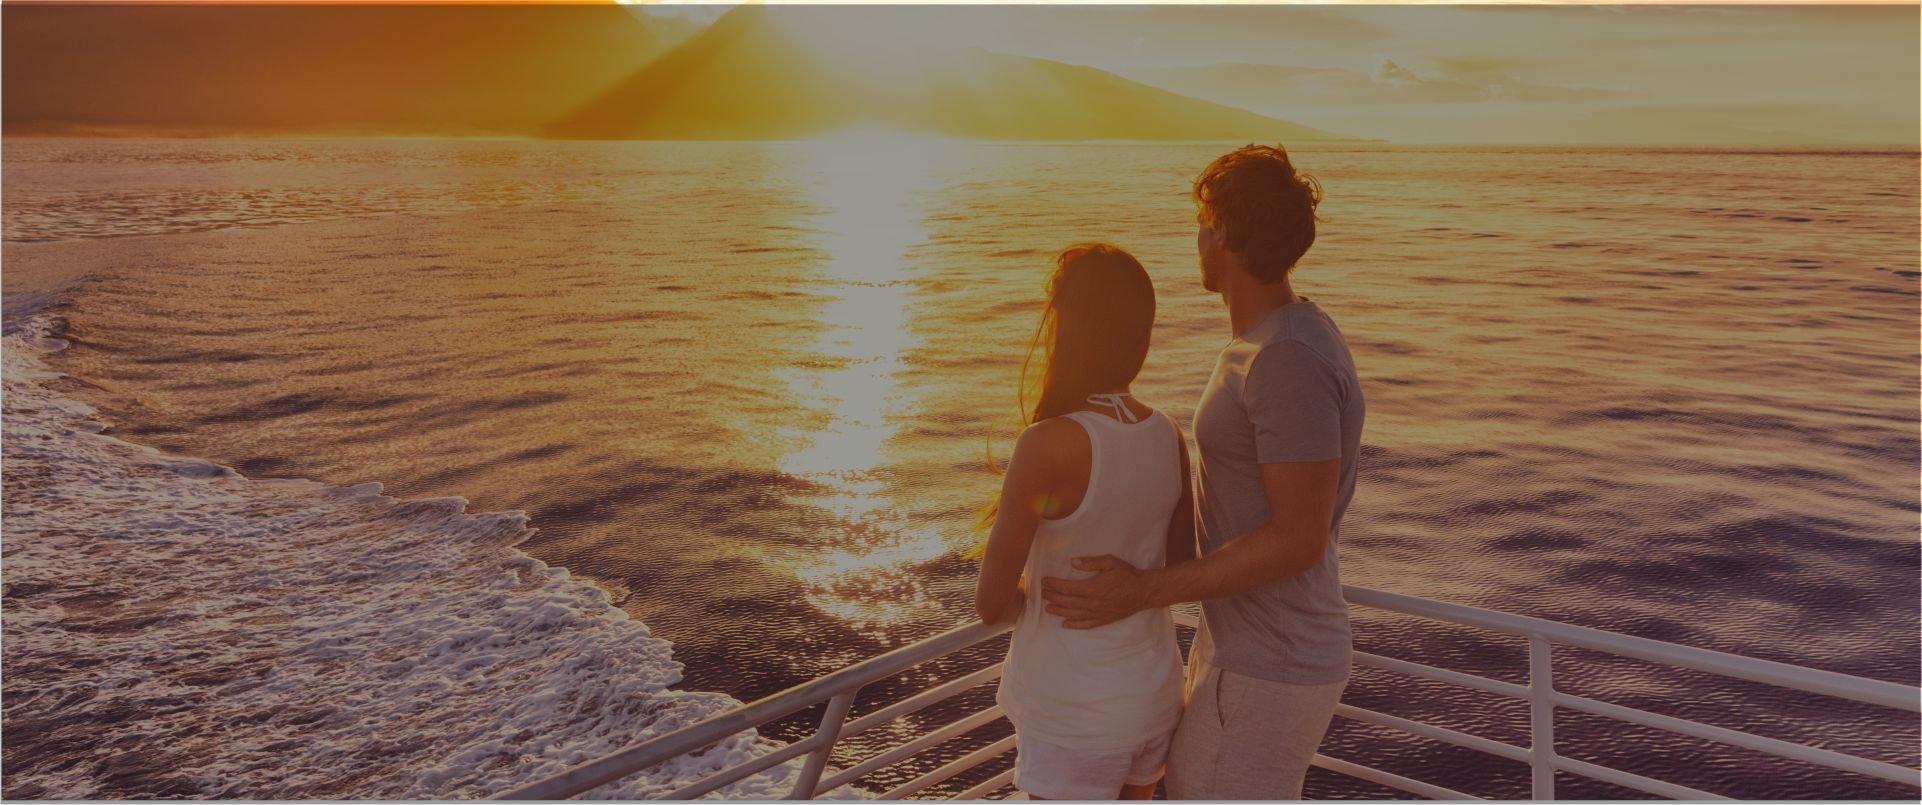 theICEway & Cruise